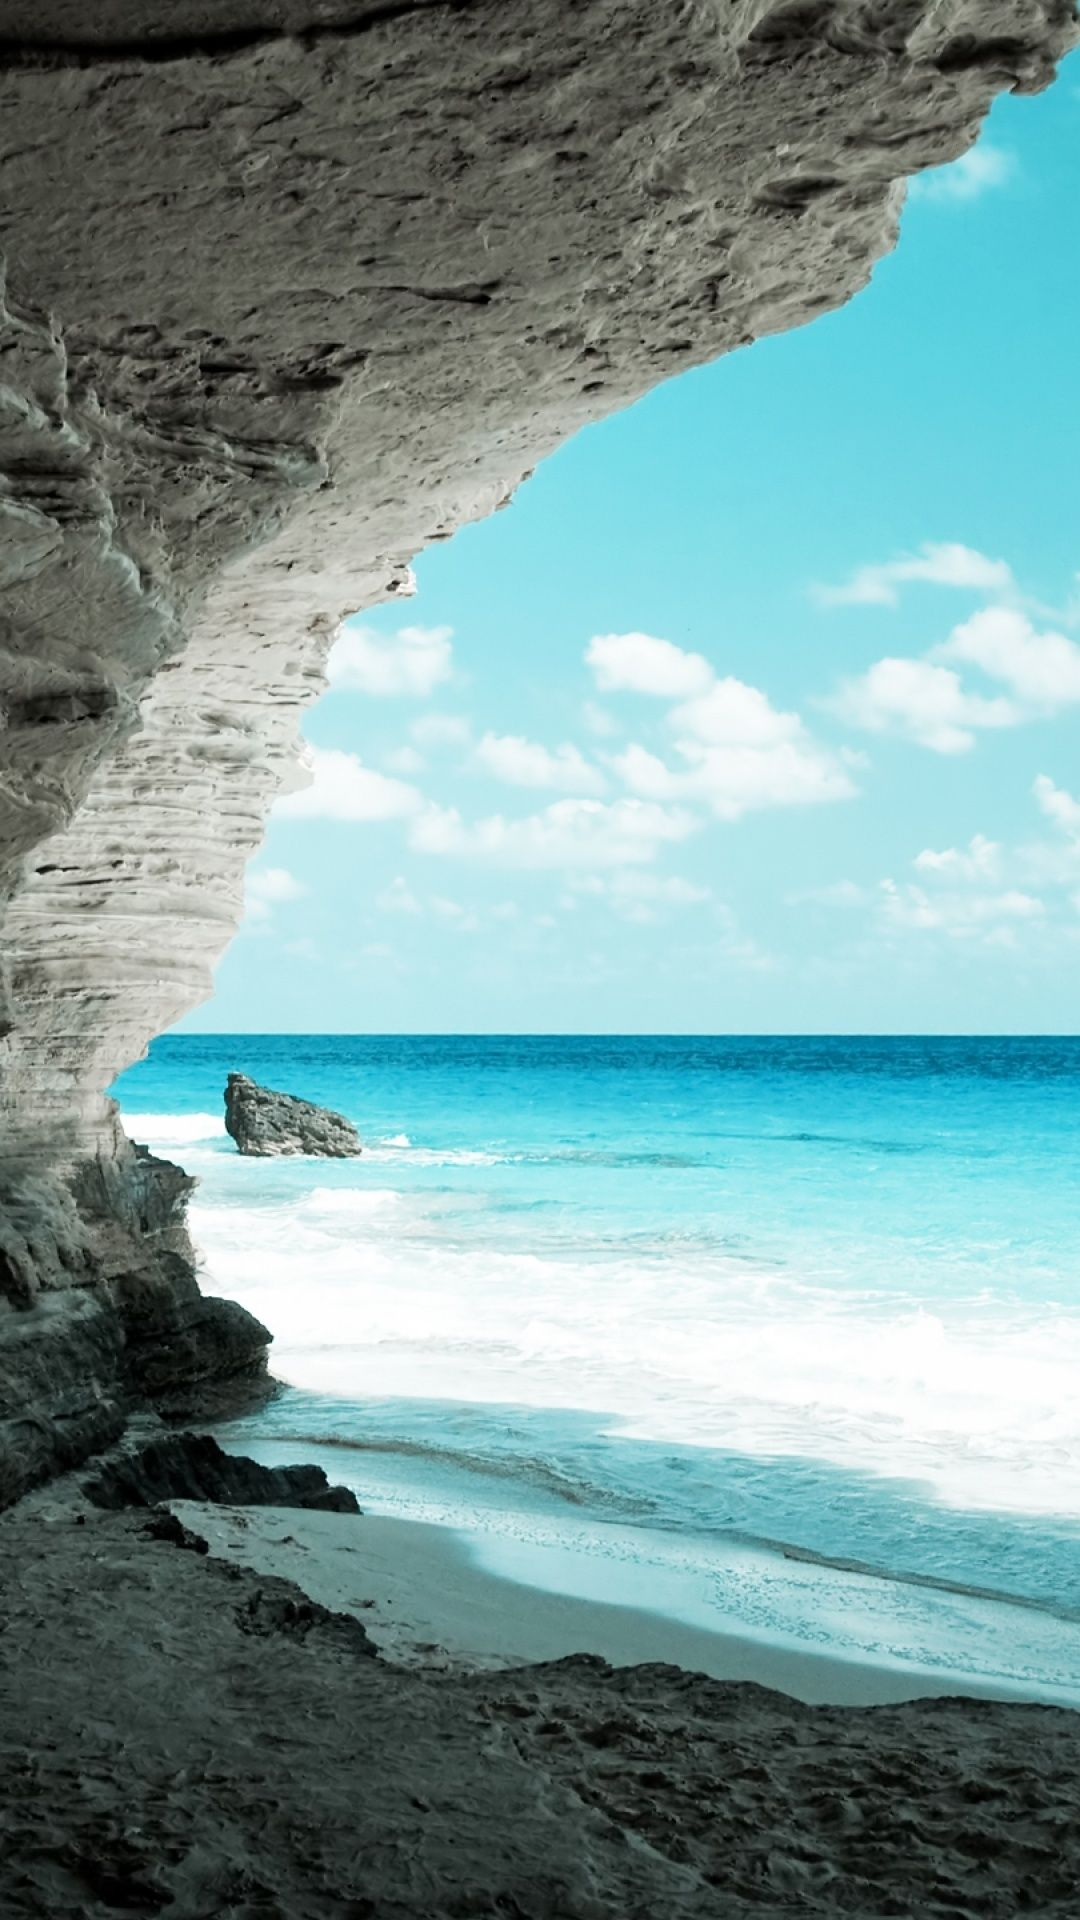 beach wallpaper phone